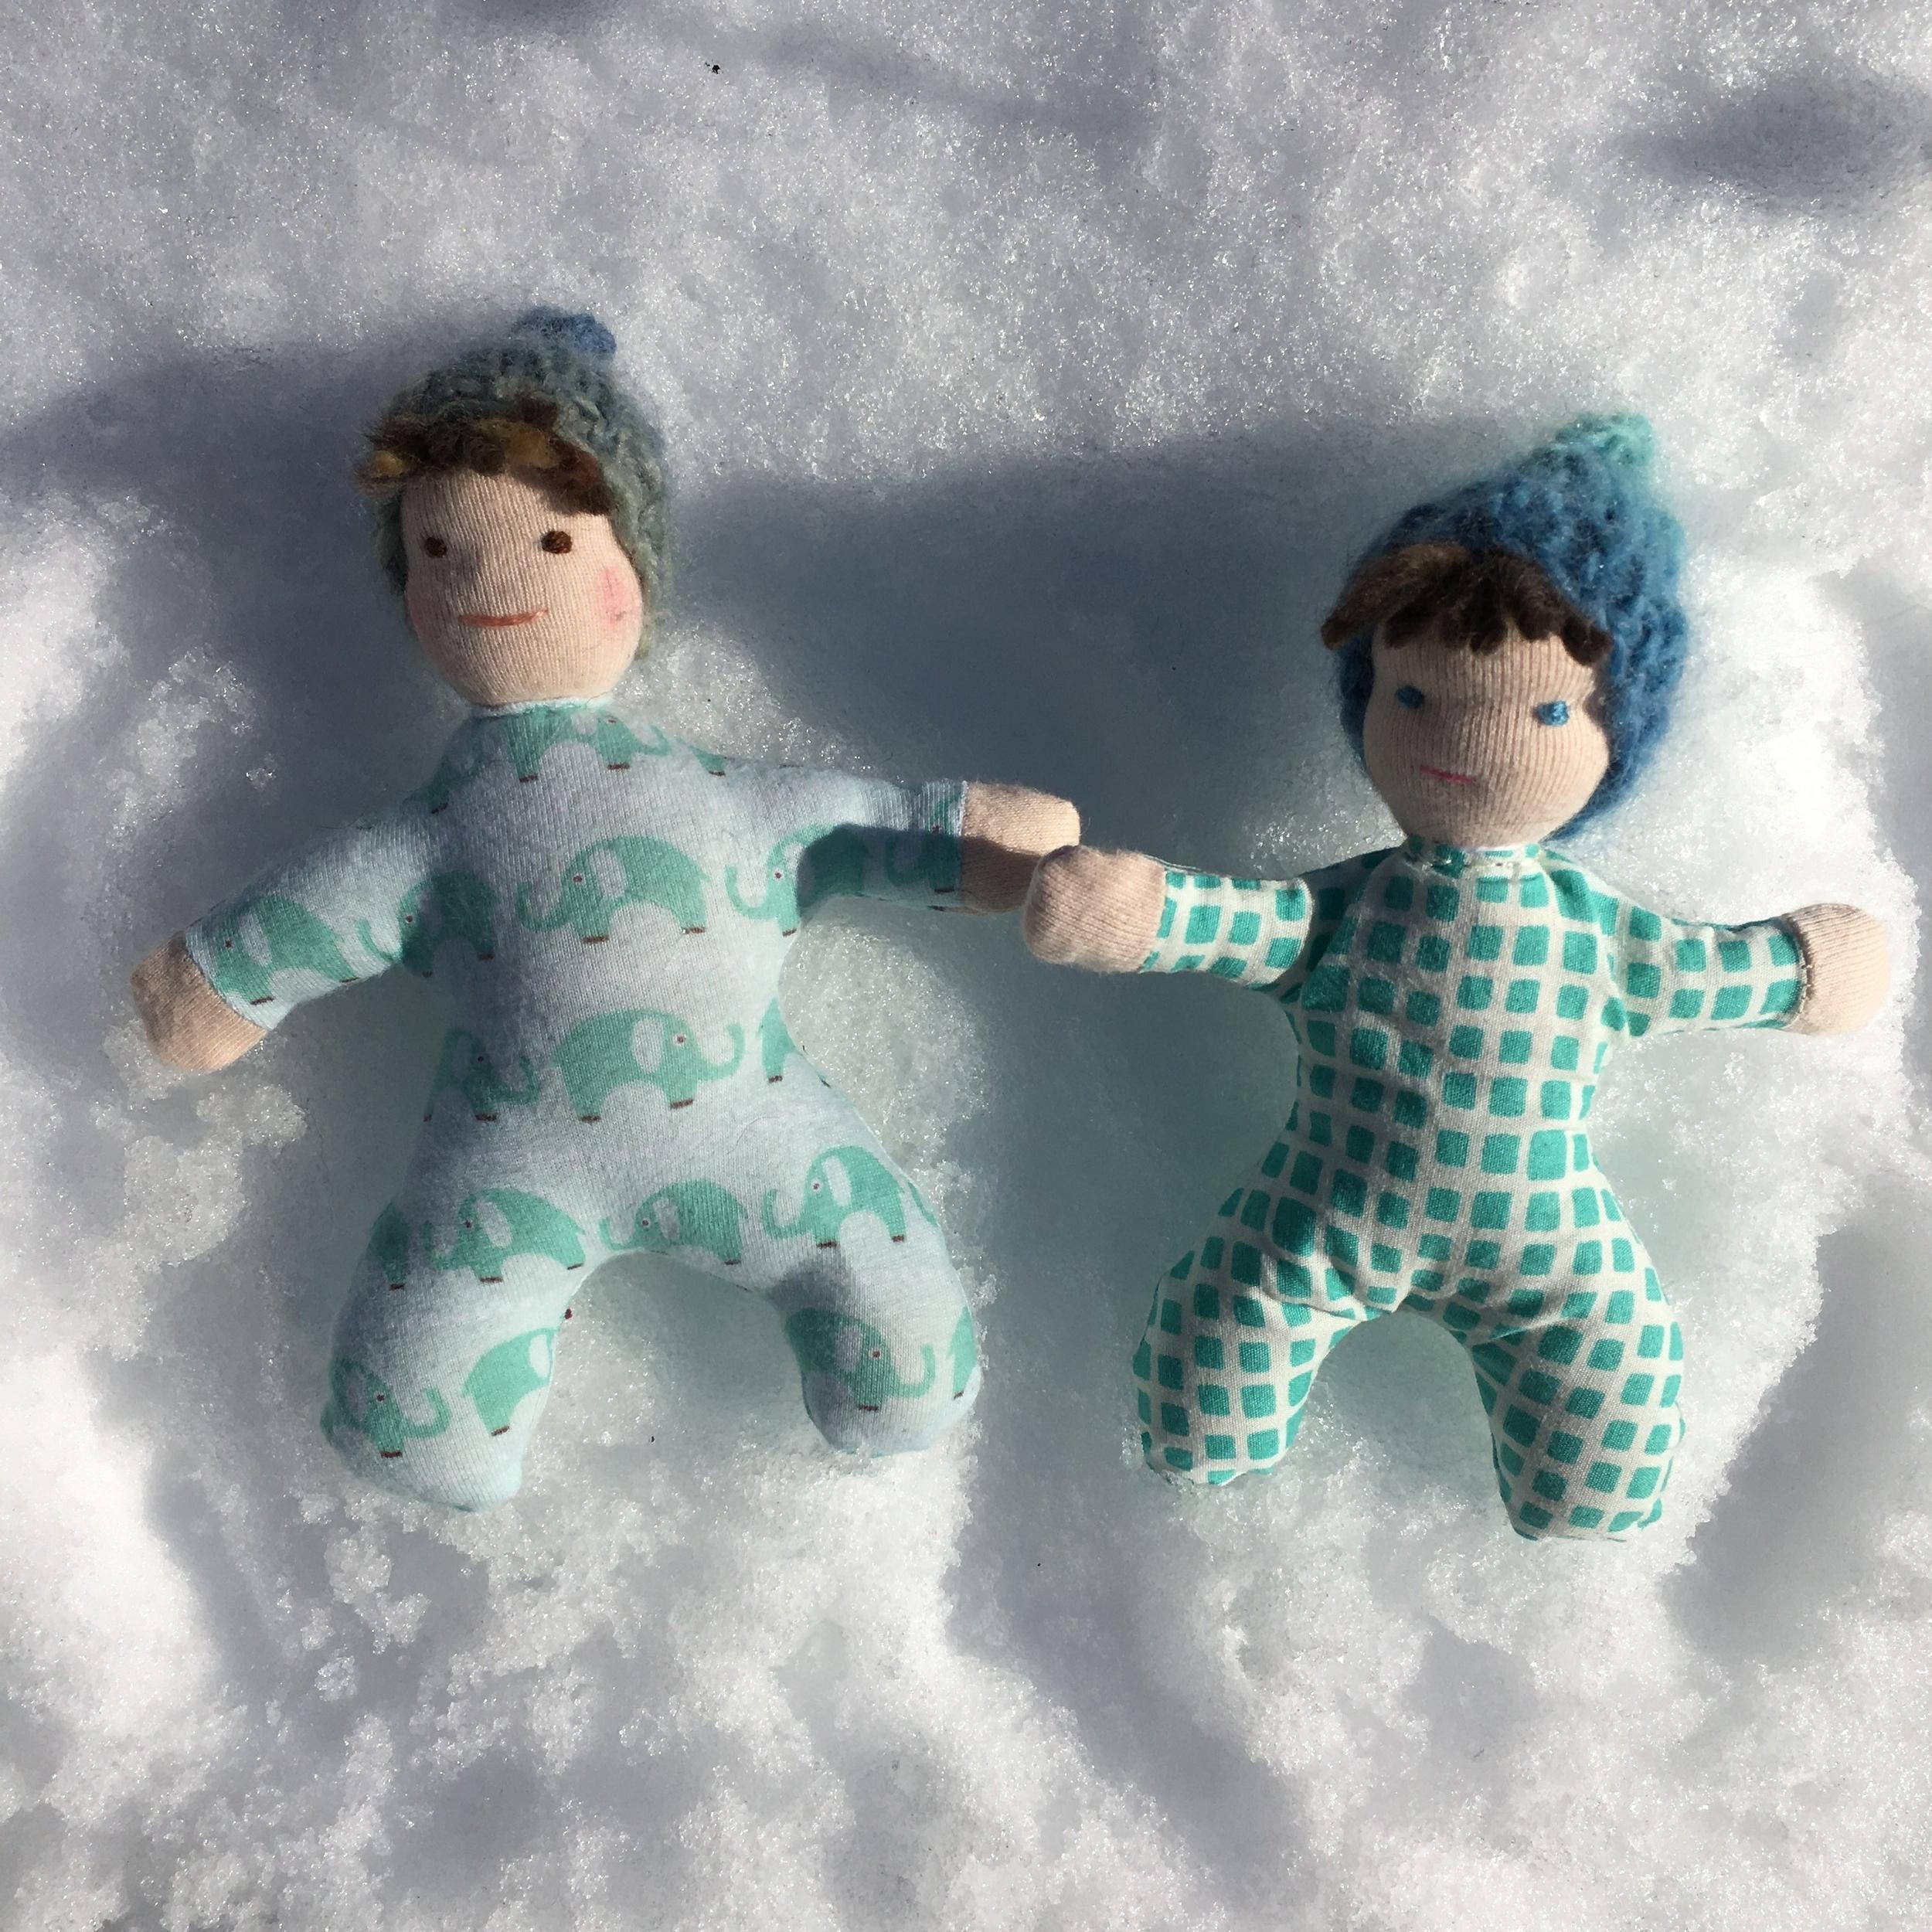 b4669082462 6 inch and 5 1/2 inch soft Waldorf dolls making Snow Angels!